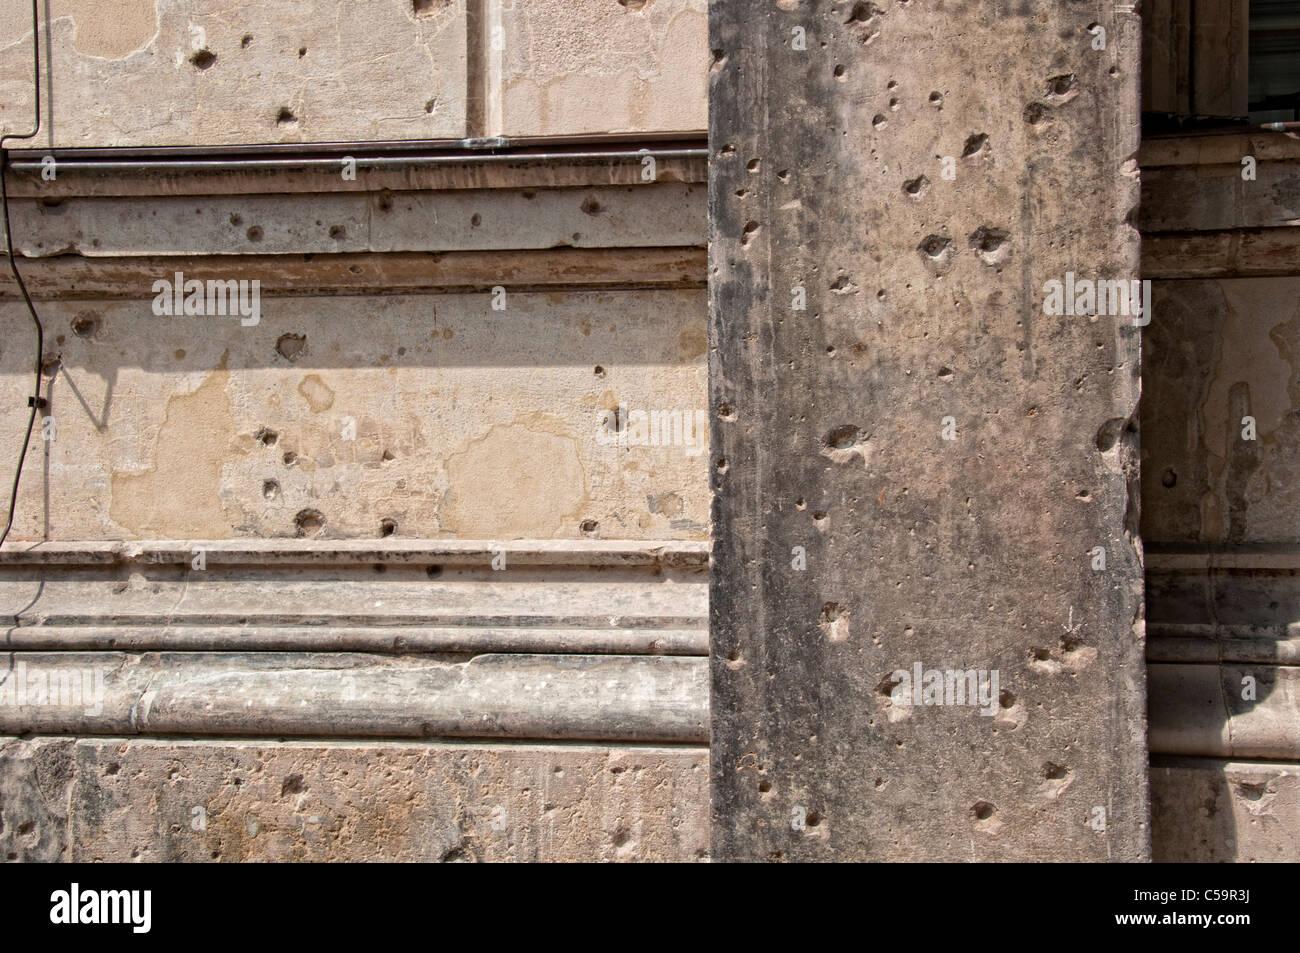 Traces of war at a wall in Berlin; Kriegsspuren an einer Mauer in Berlin - Stock Image